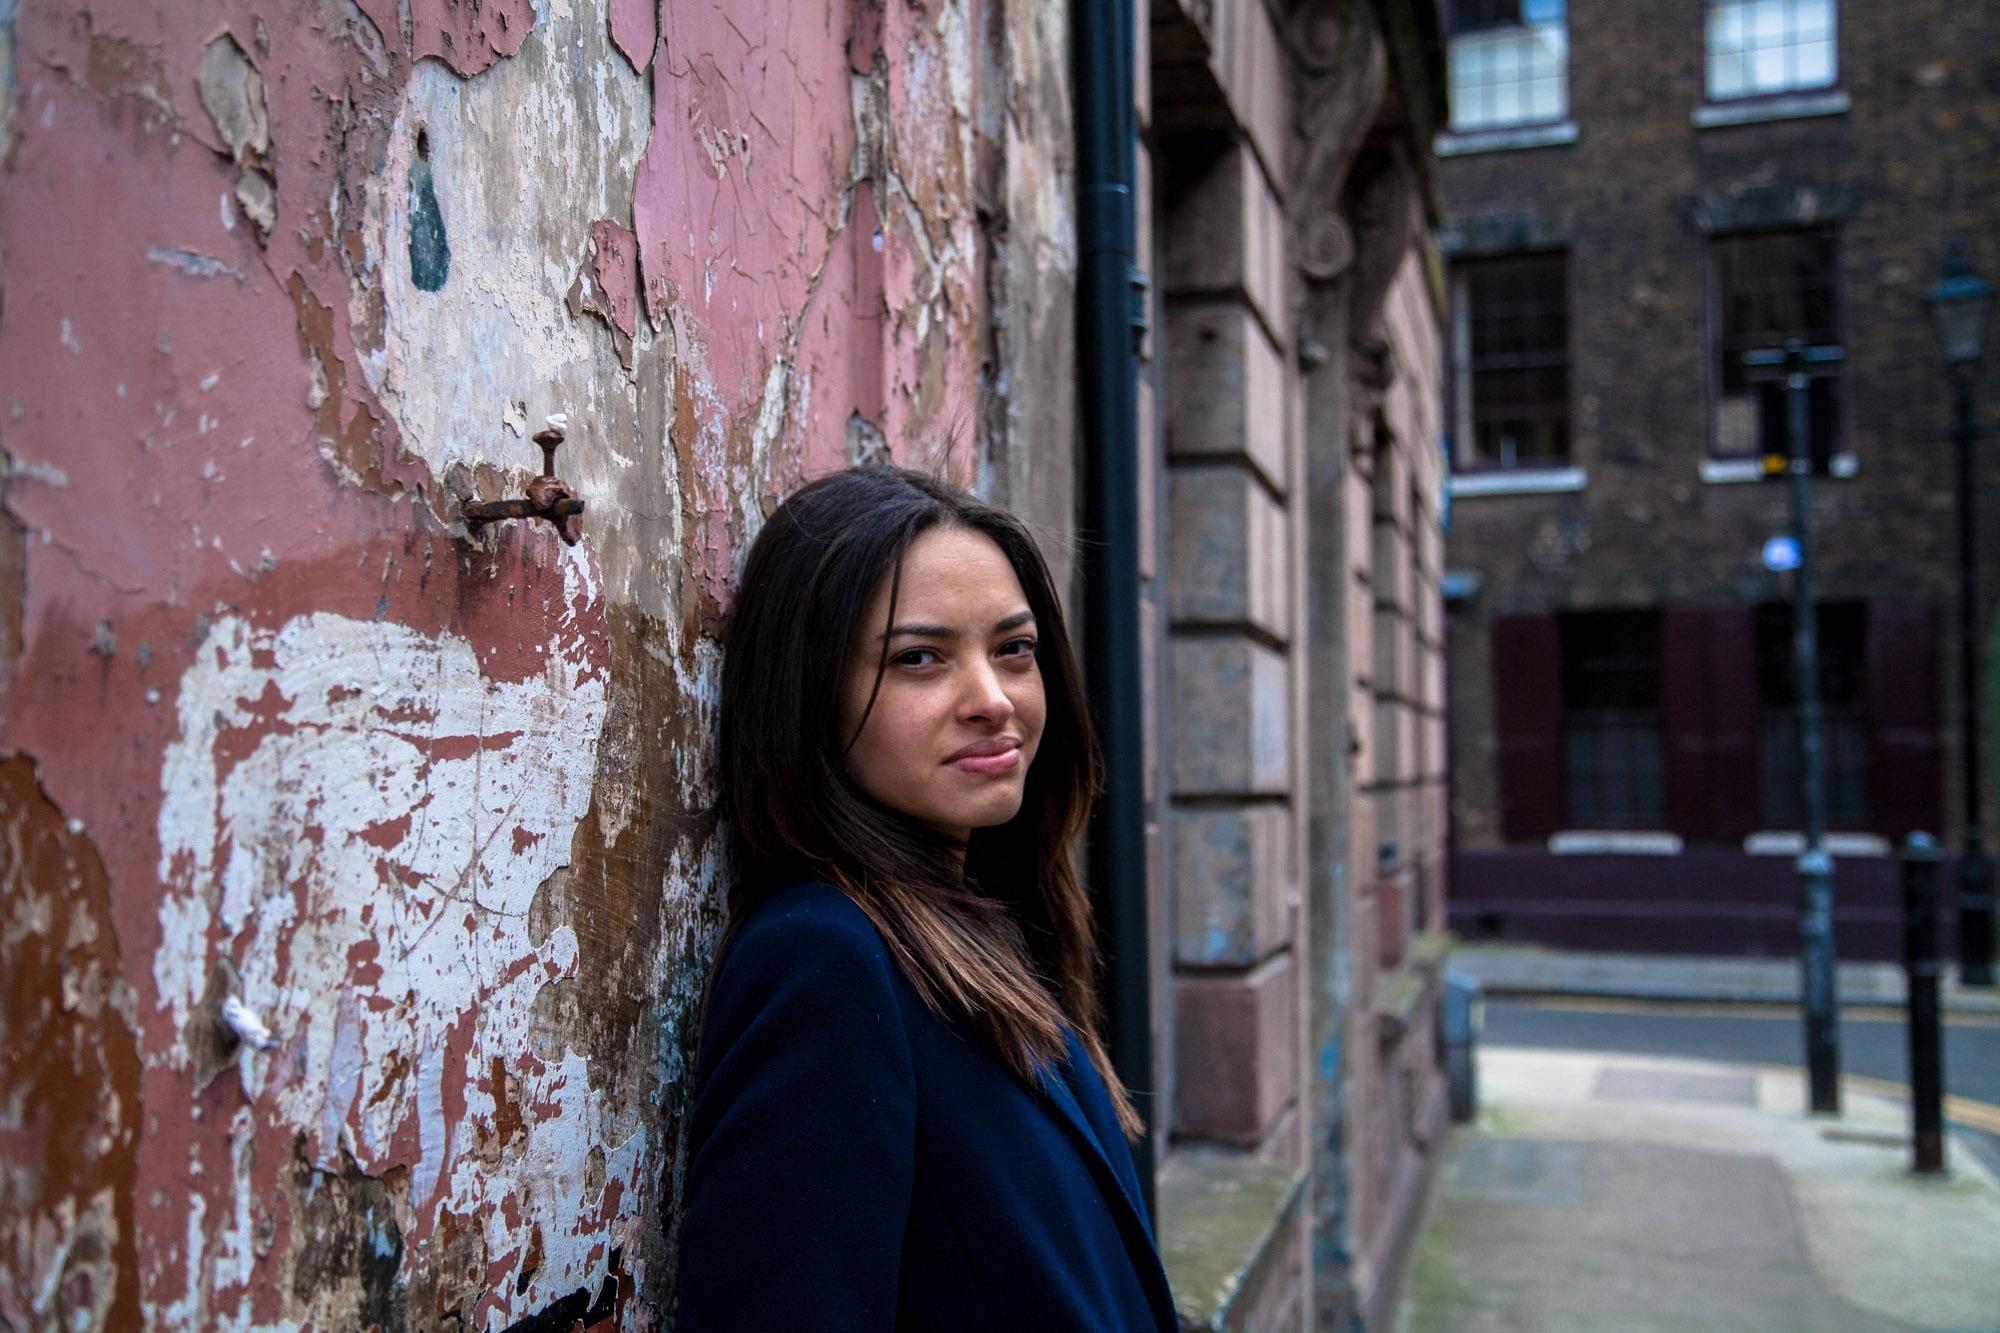 portraits-photographer-oxford-london-jonathan-self-photography_-33.jpg